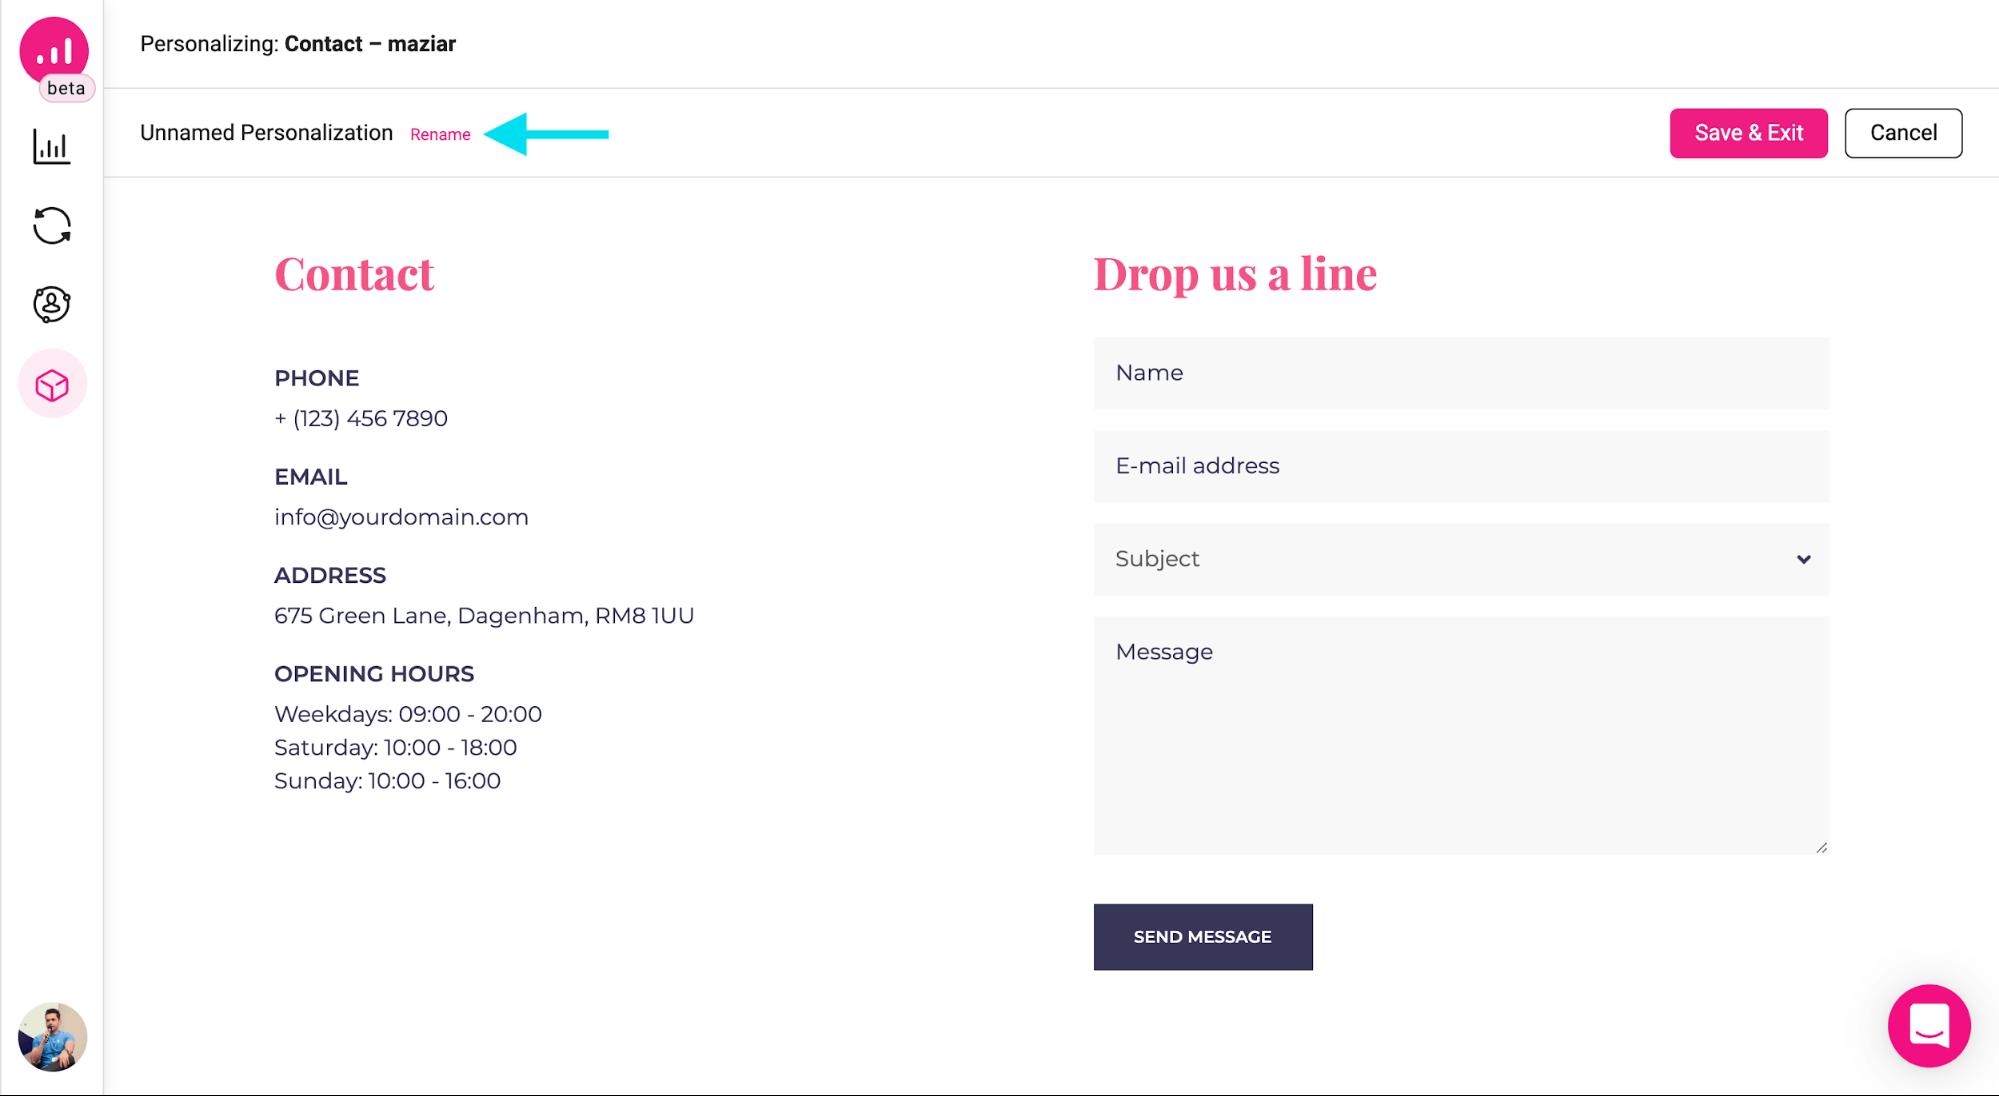 webpage personalizer - renaming personalization